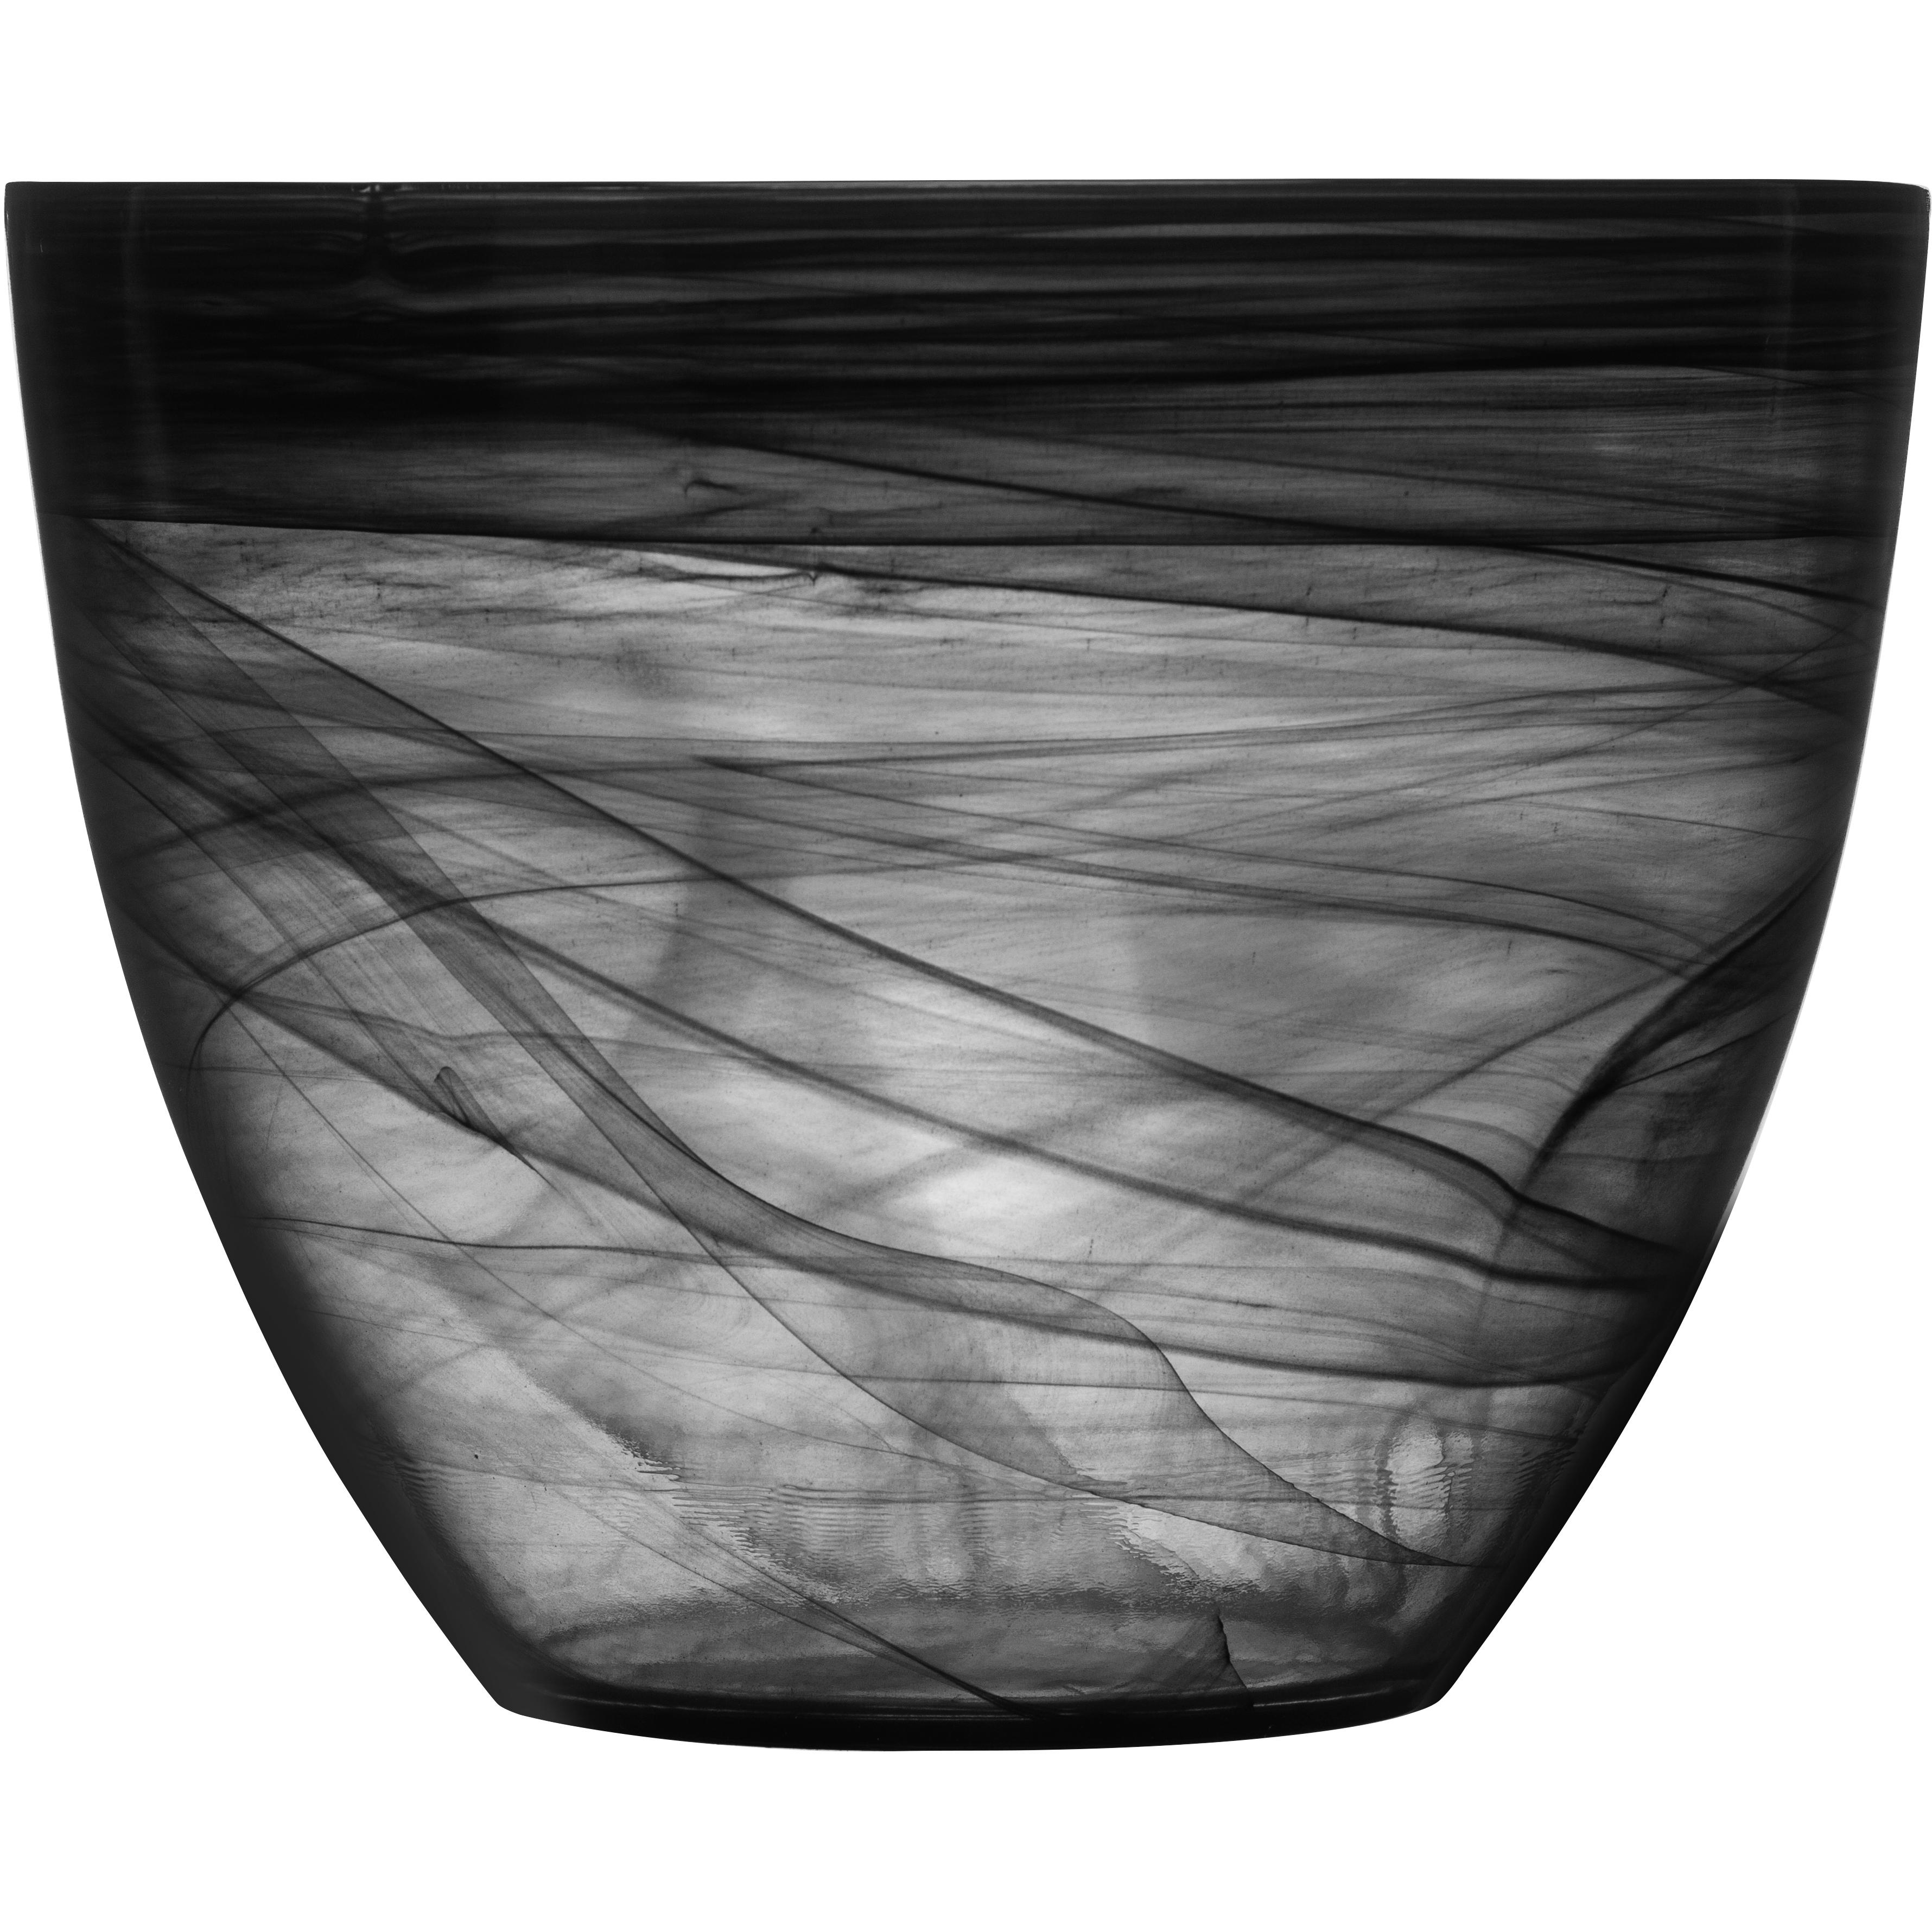 SEAglasbruk Black and White Large Black Glass Bowl